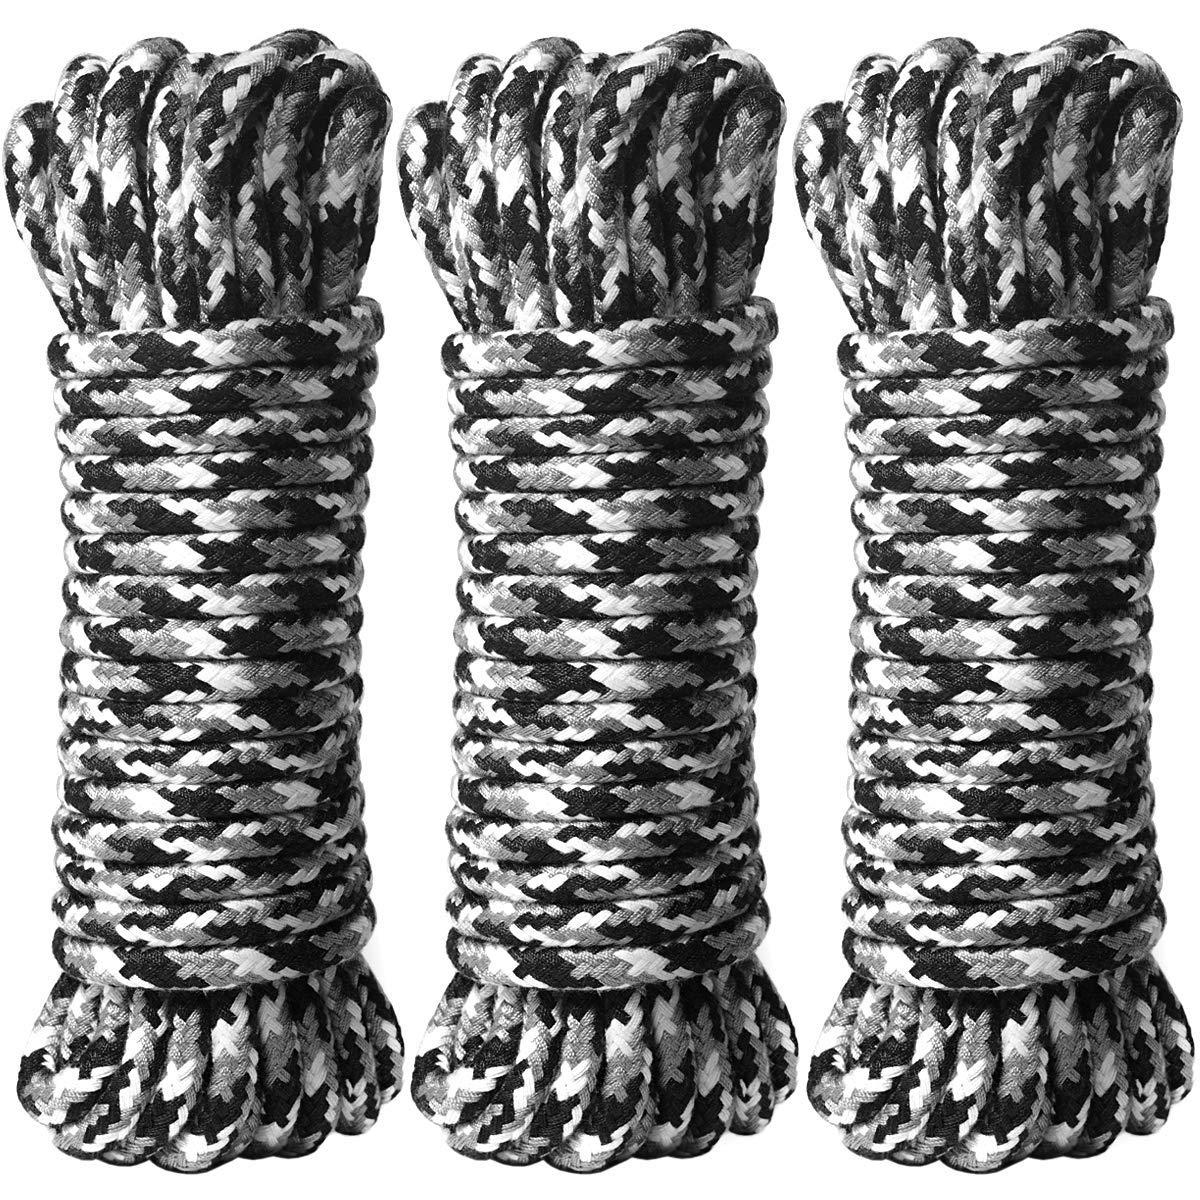 BONTIME All-Purpose Soft Cotton Rope - 32 Feet Length,1/3-Inch Diameter(Black & Grey & White,Pack of 3)